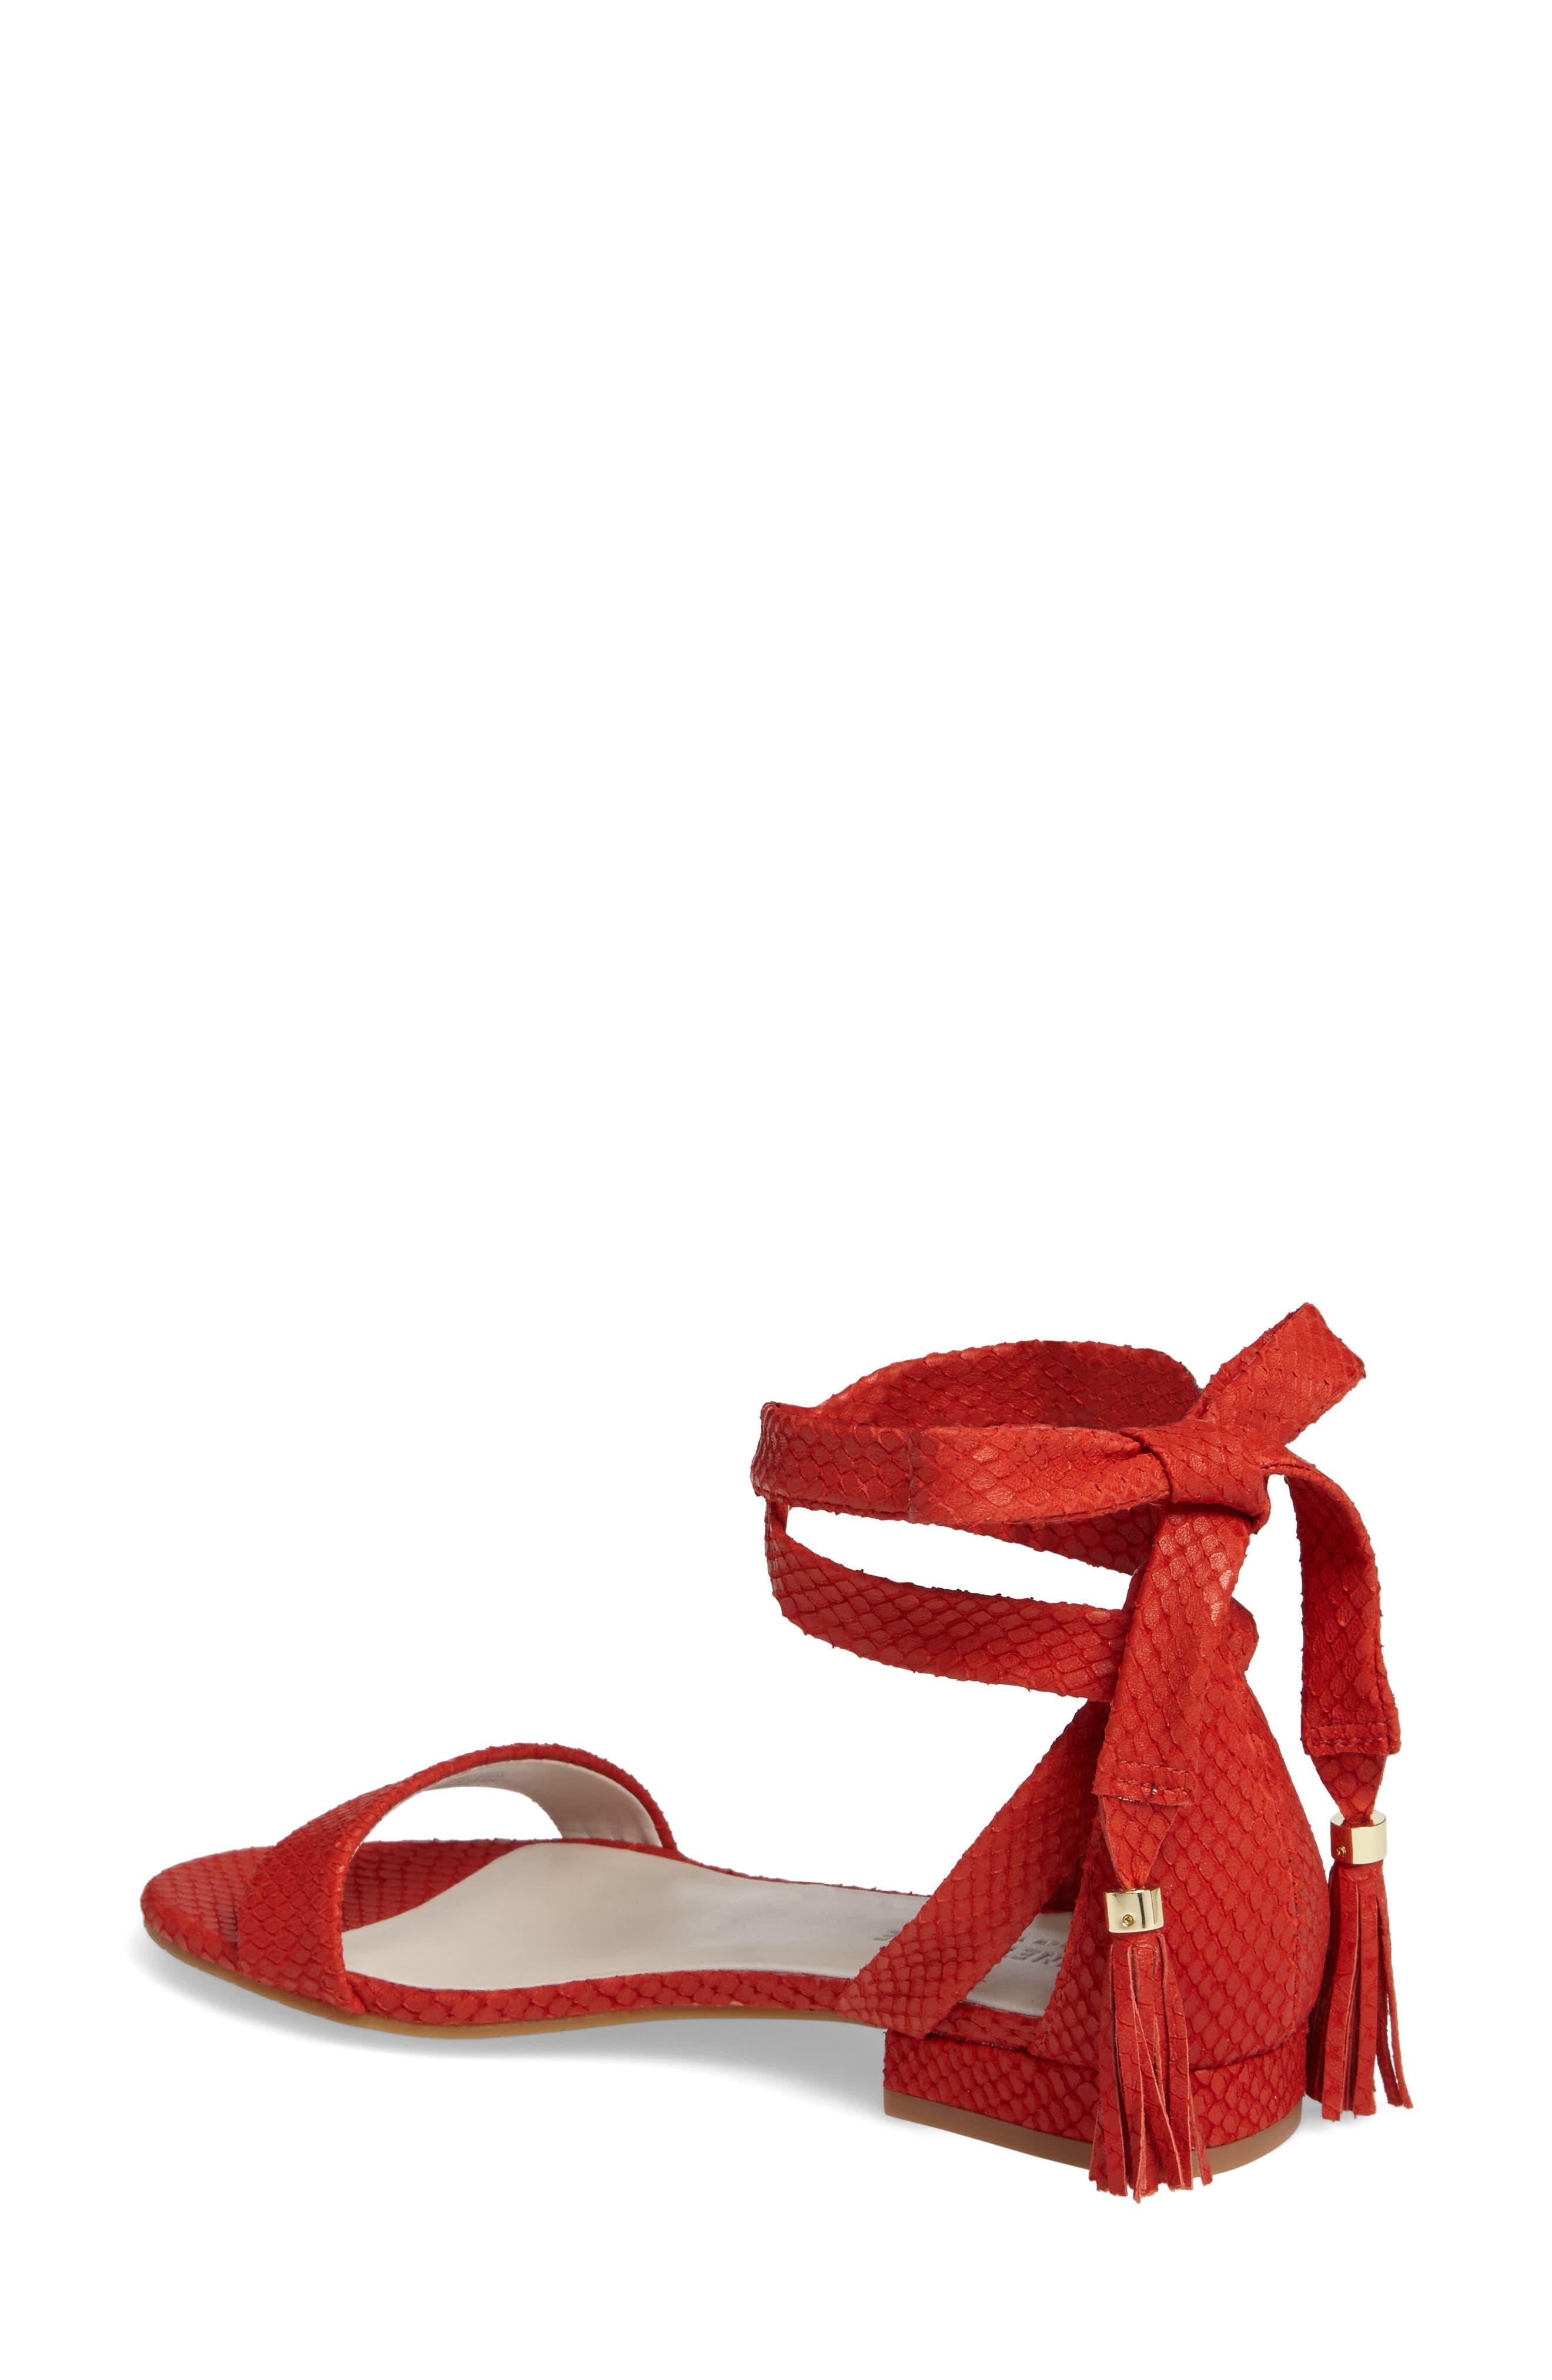 Valen Tassel Lace-Up Sandal,                             Alternate thumbnail 24, color,